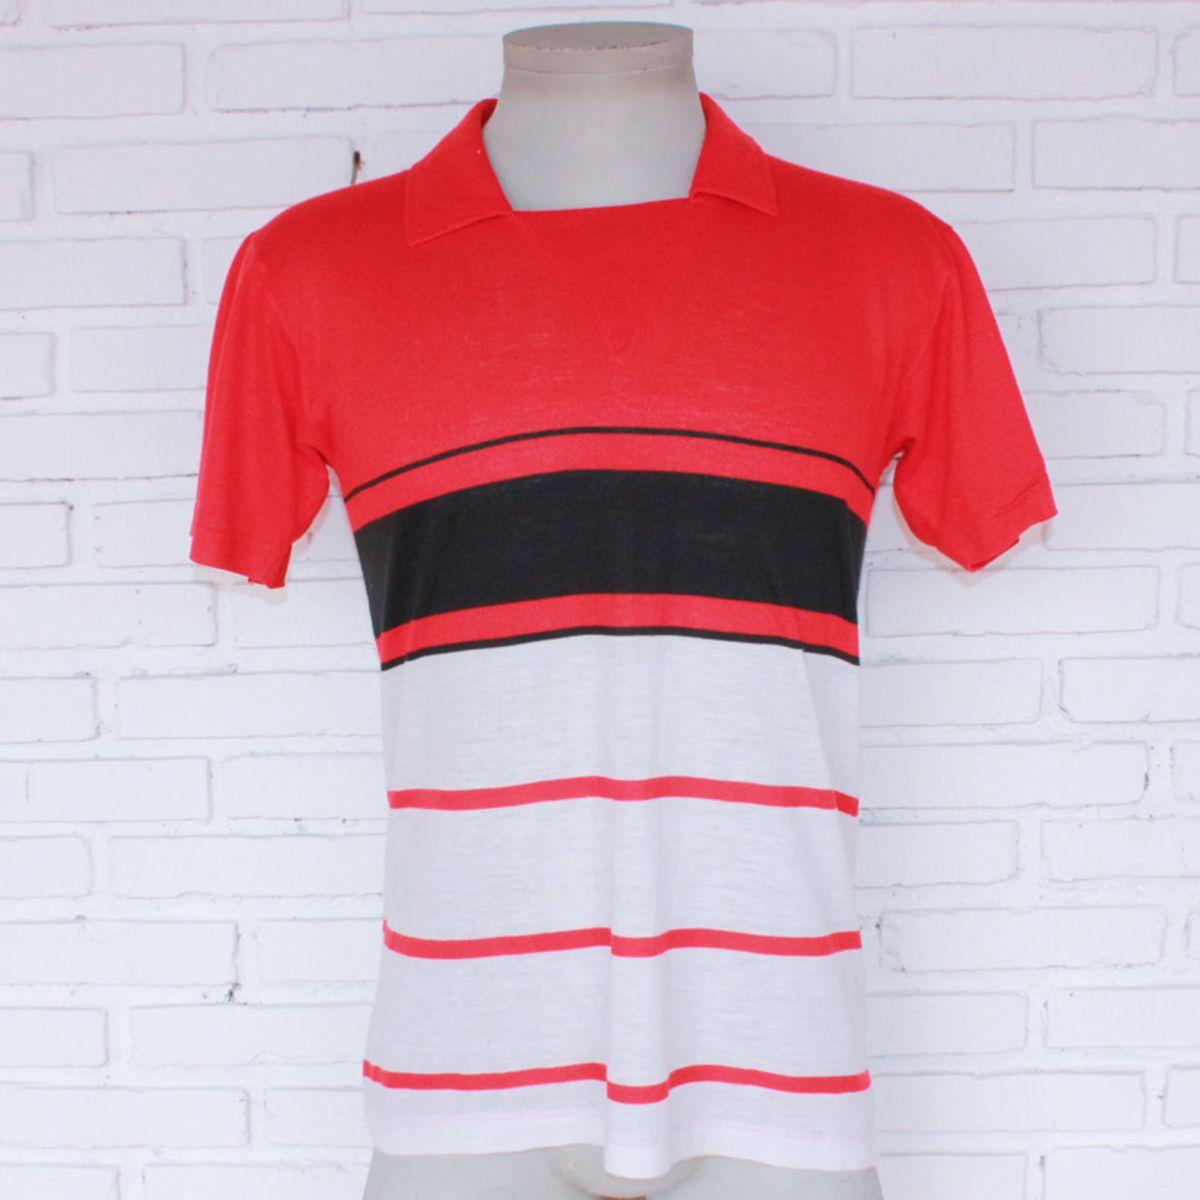 a041e6441ea42 futebol vintage - camisetas sem marca.  Czm6ly9wag90b3muzw5qb2vplmnvbs5ici9wcm9kdwn0cy8ynde0njevzjqzmjfmzmzmmthjyjmynti2mtfmztnizdgwmja0mzkuanbn  ...